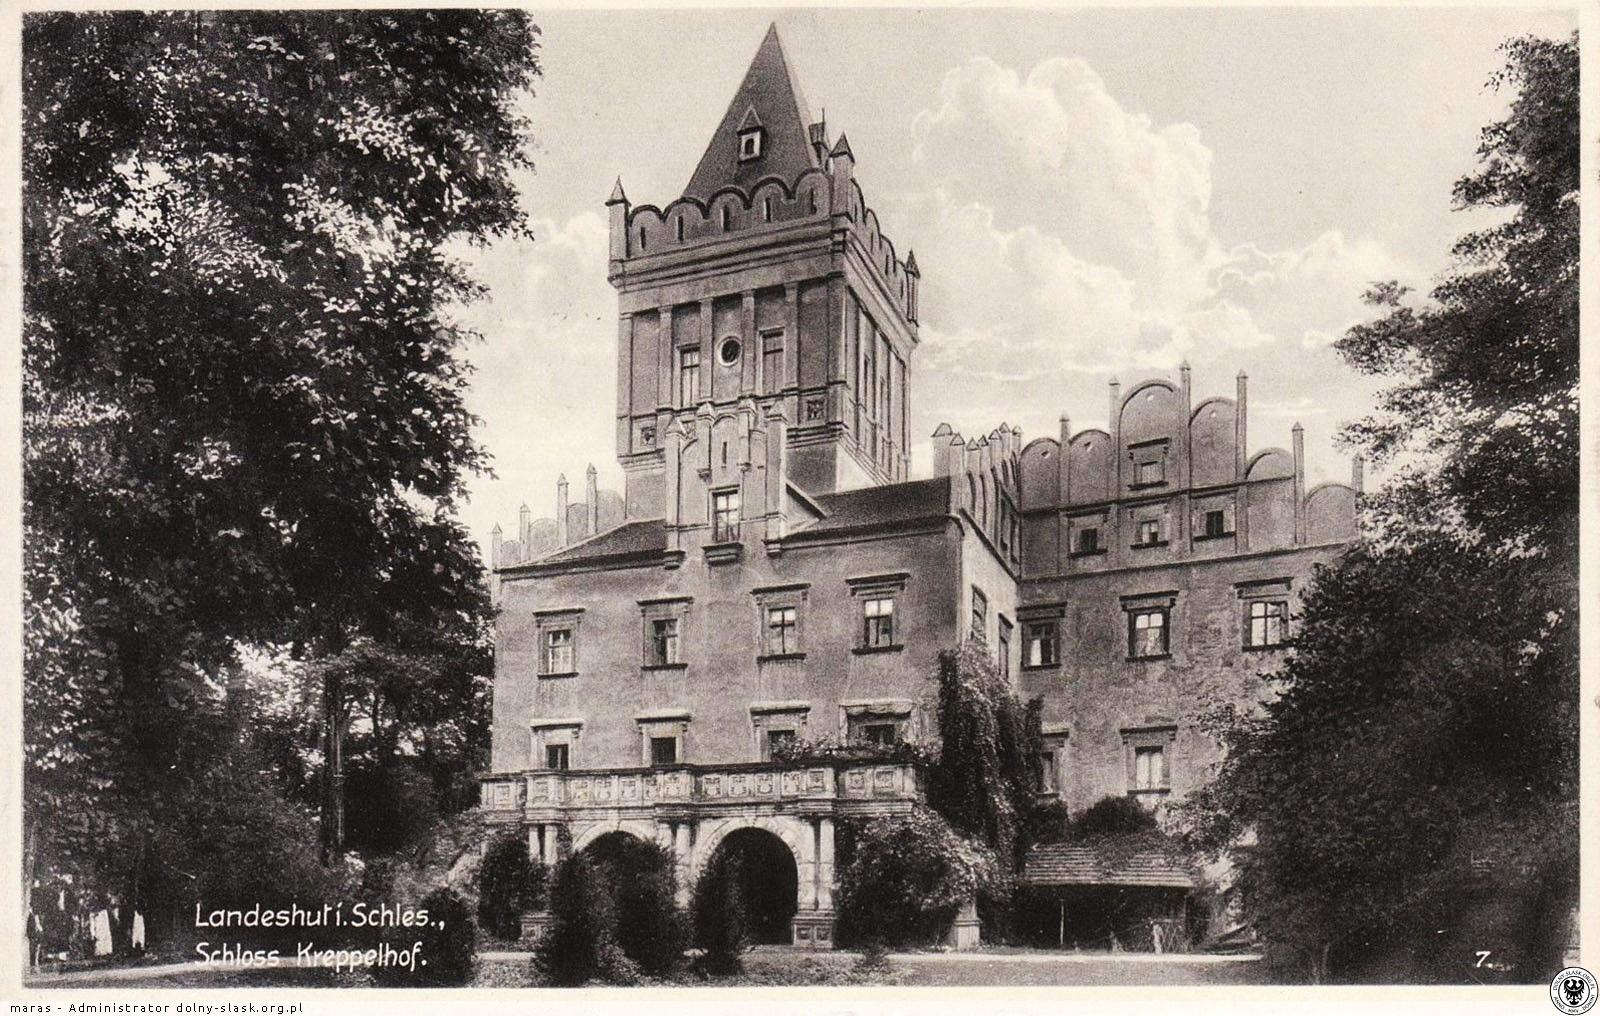 Zamek Grodztwo (Schloss Kreppelhof) 1930 r. Źródło: polska-org.pl